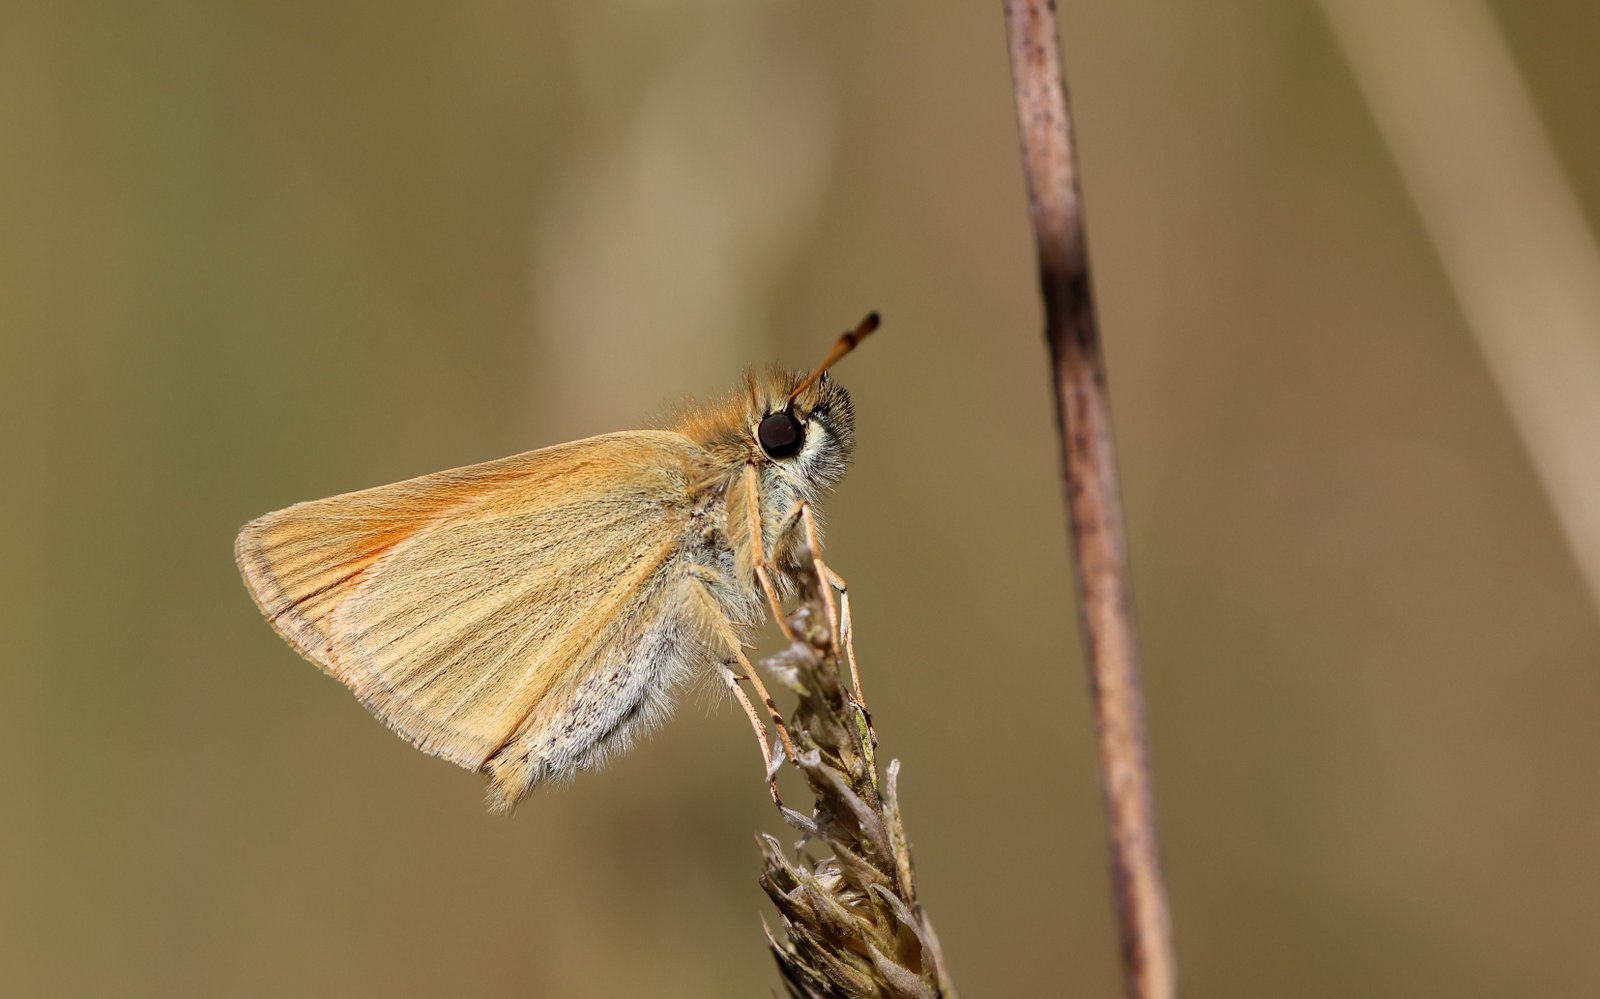 Stregbredpande, Thymelicus lineola